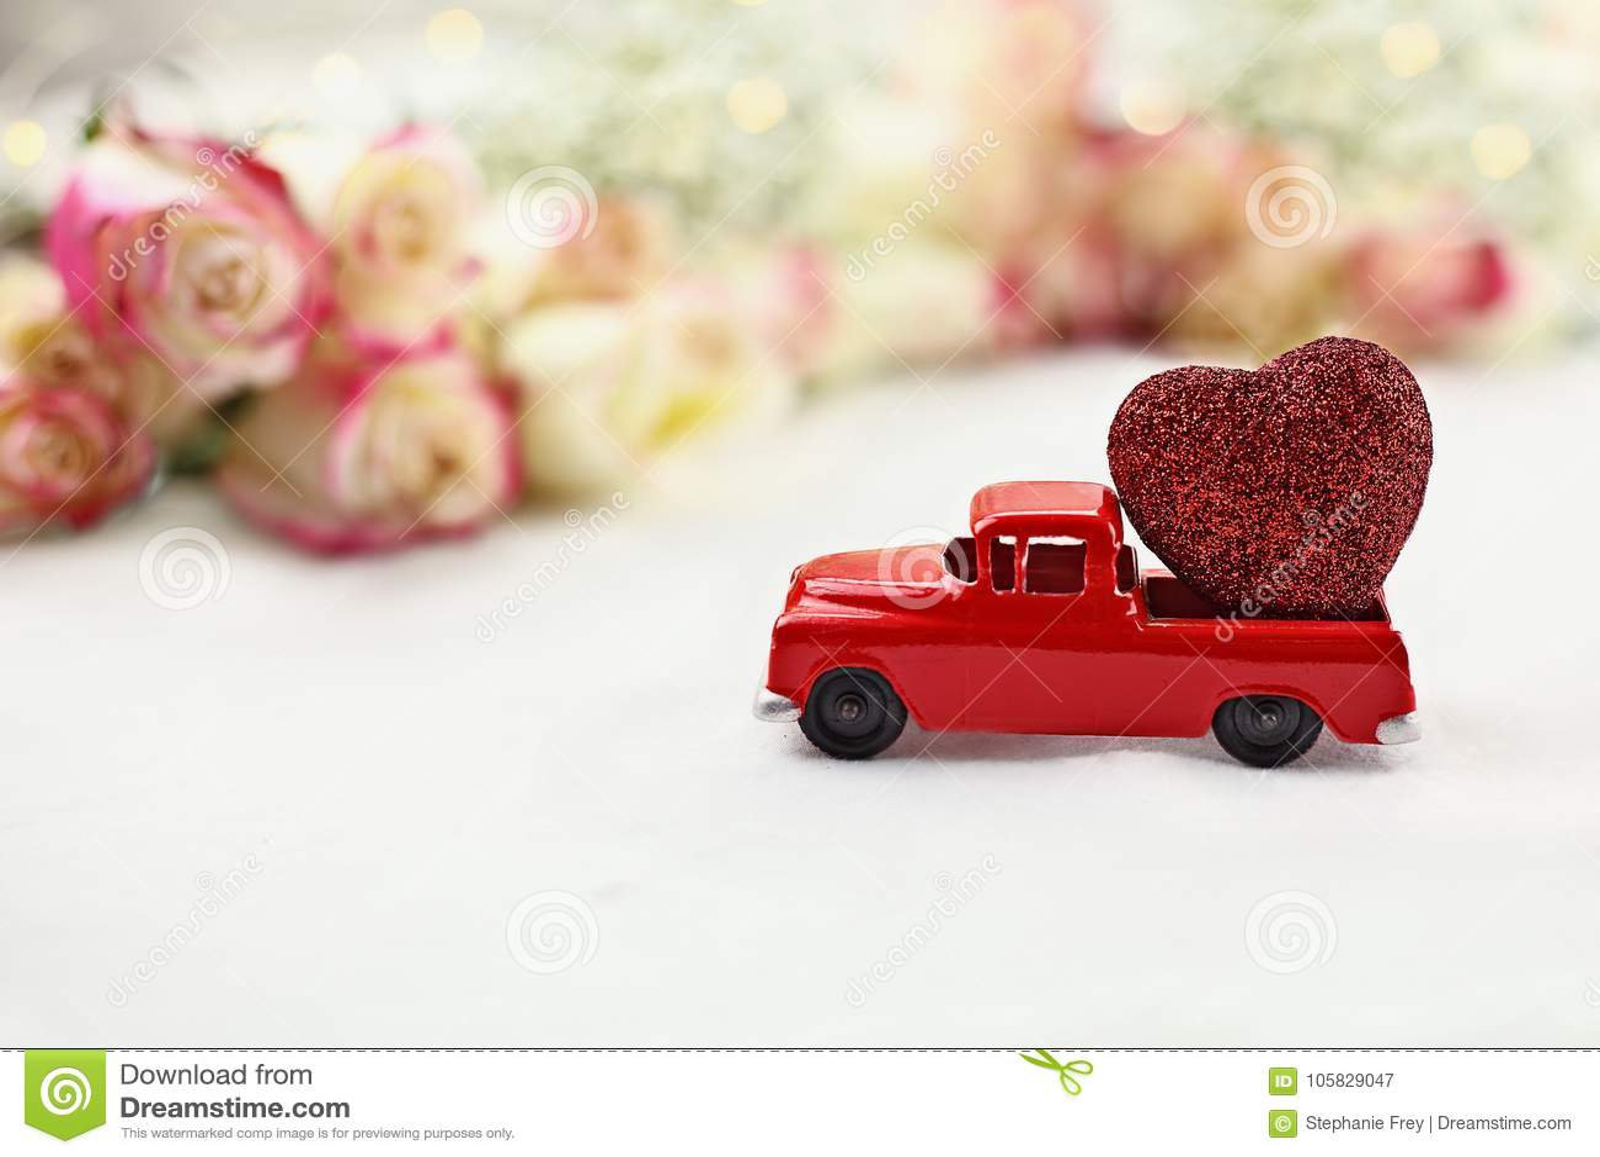 Valentine S Day Vintage Toys : Vintage toy trucks s wow